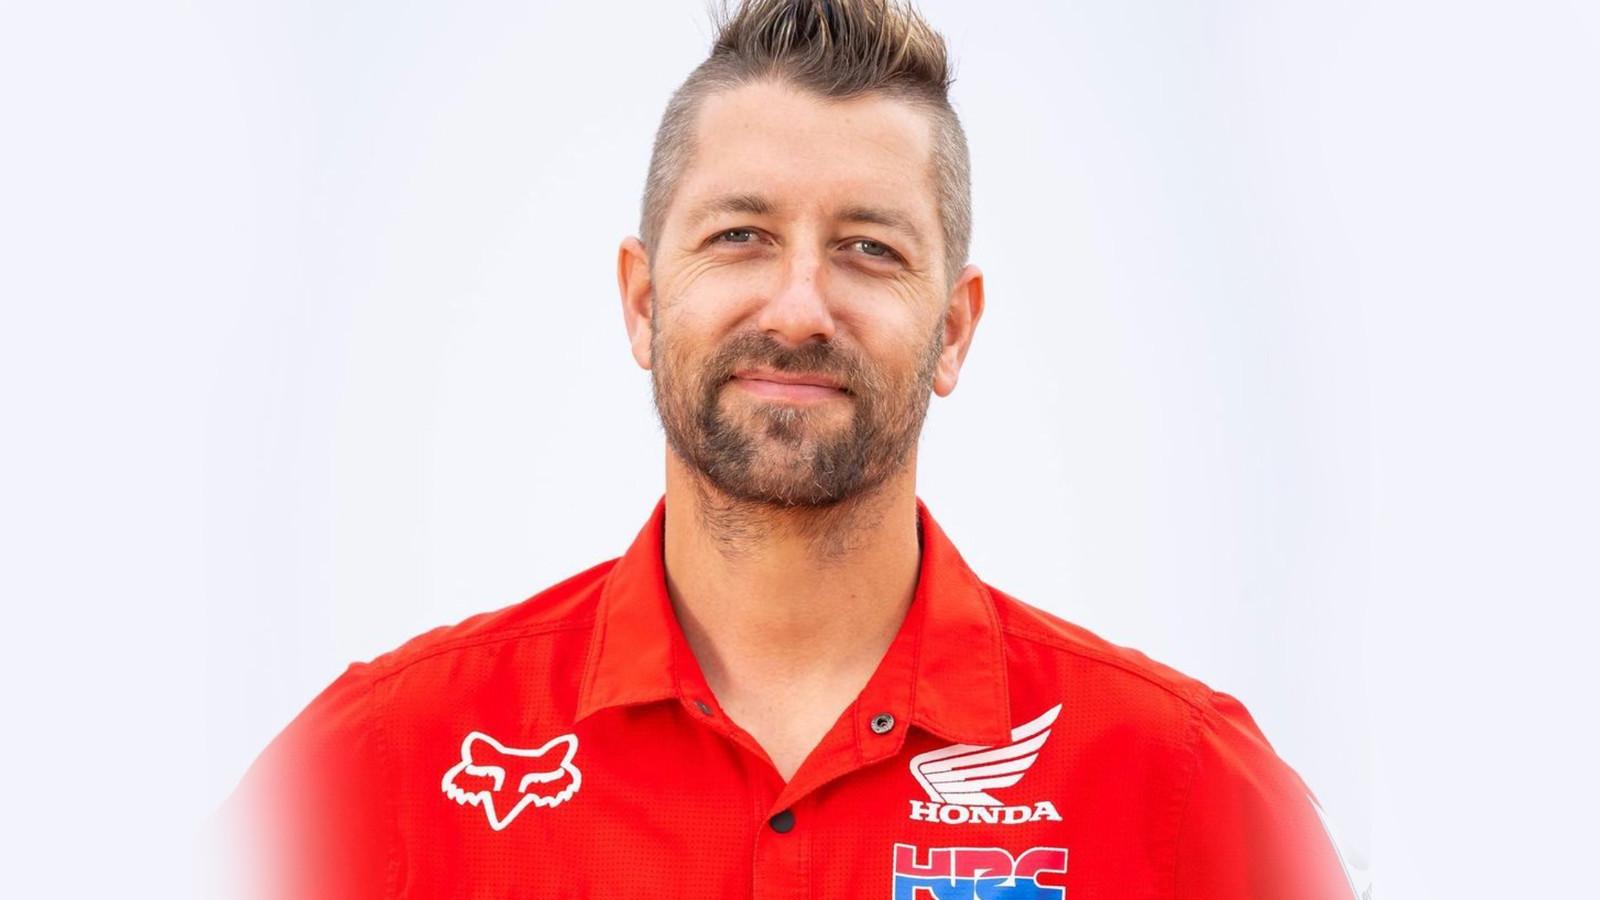 Team Honda HRC Appoints New Team Manager - Lars Lindstrom